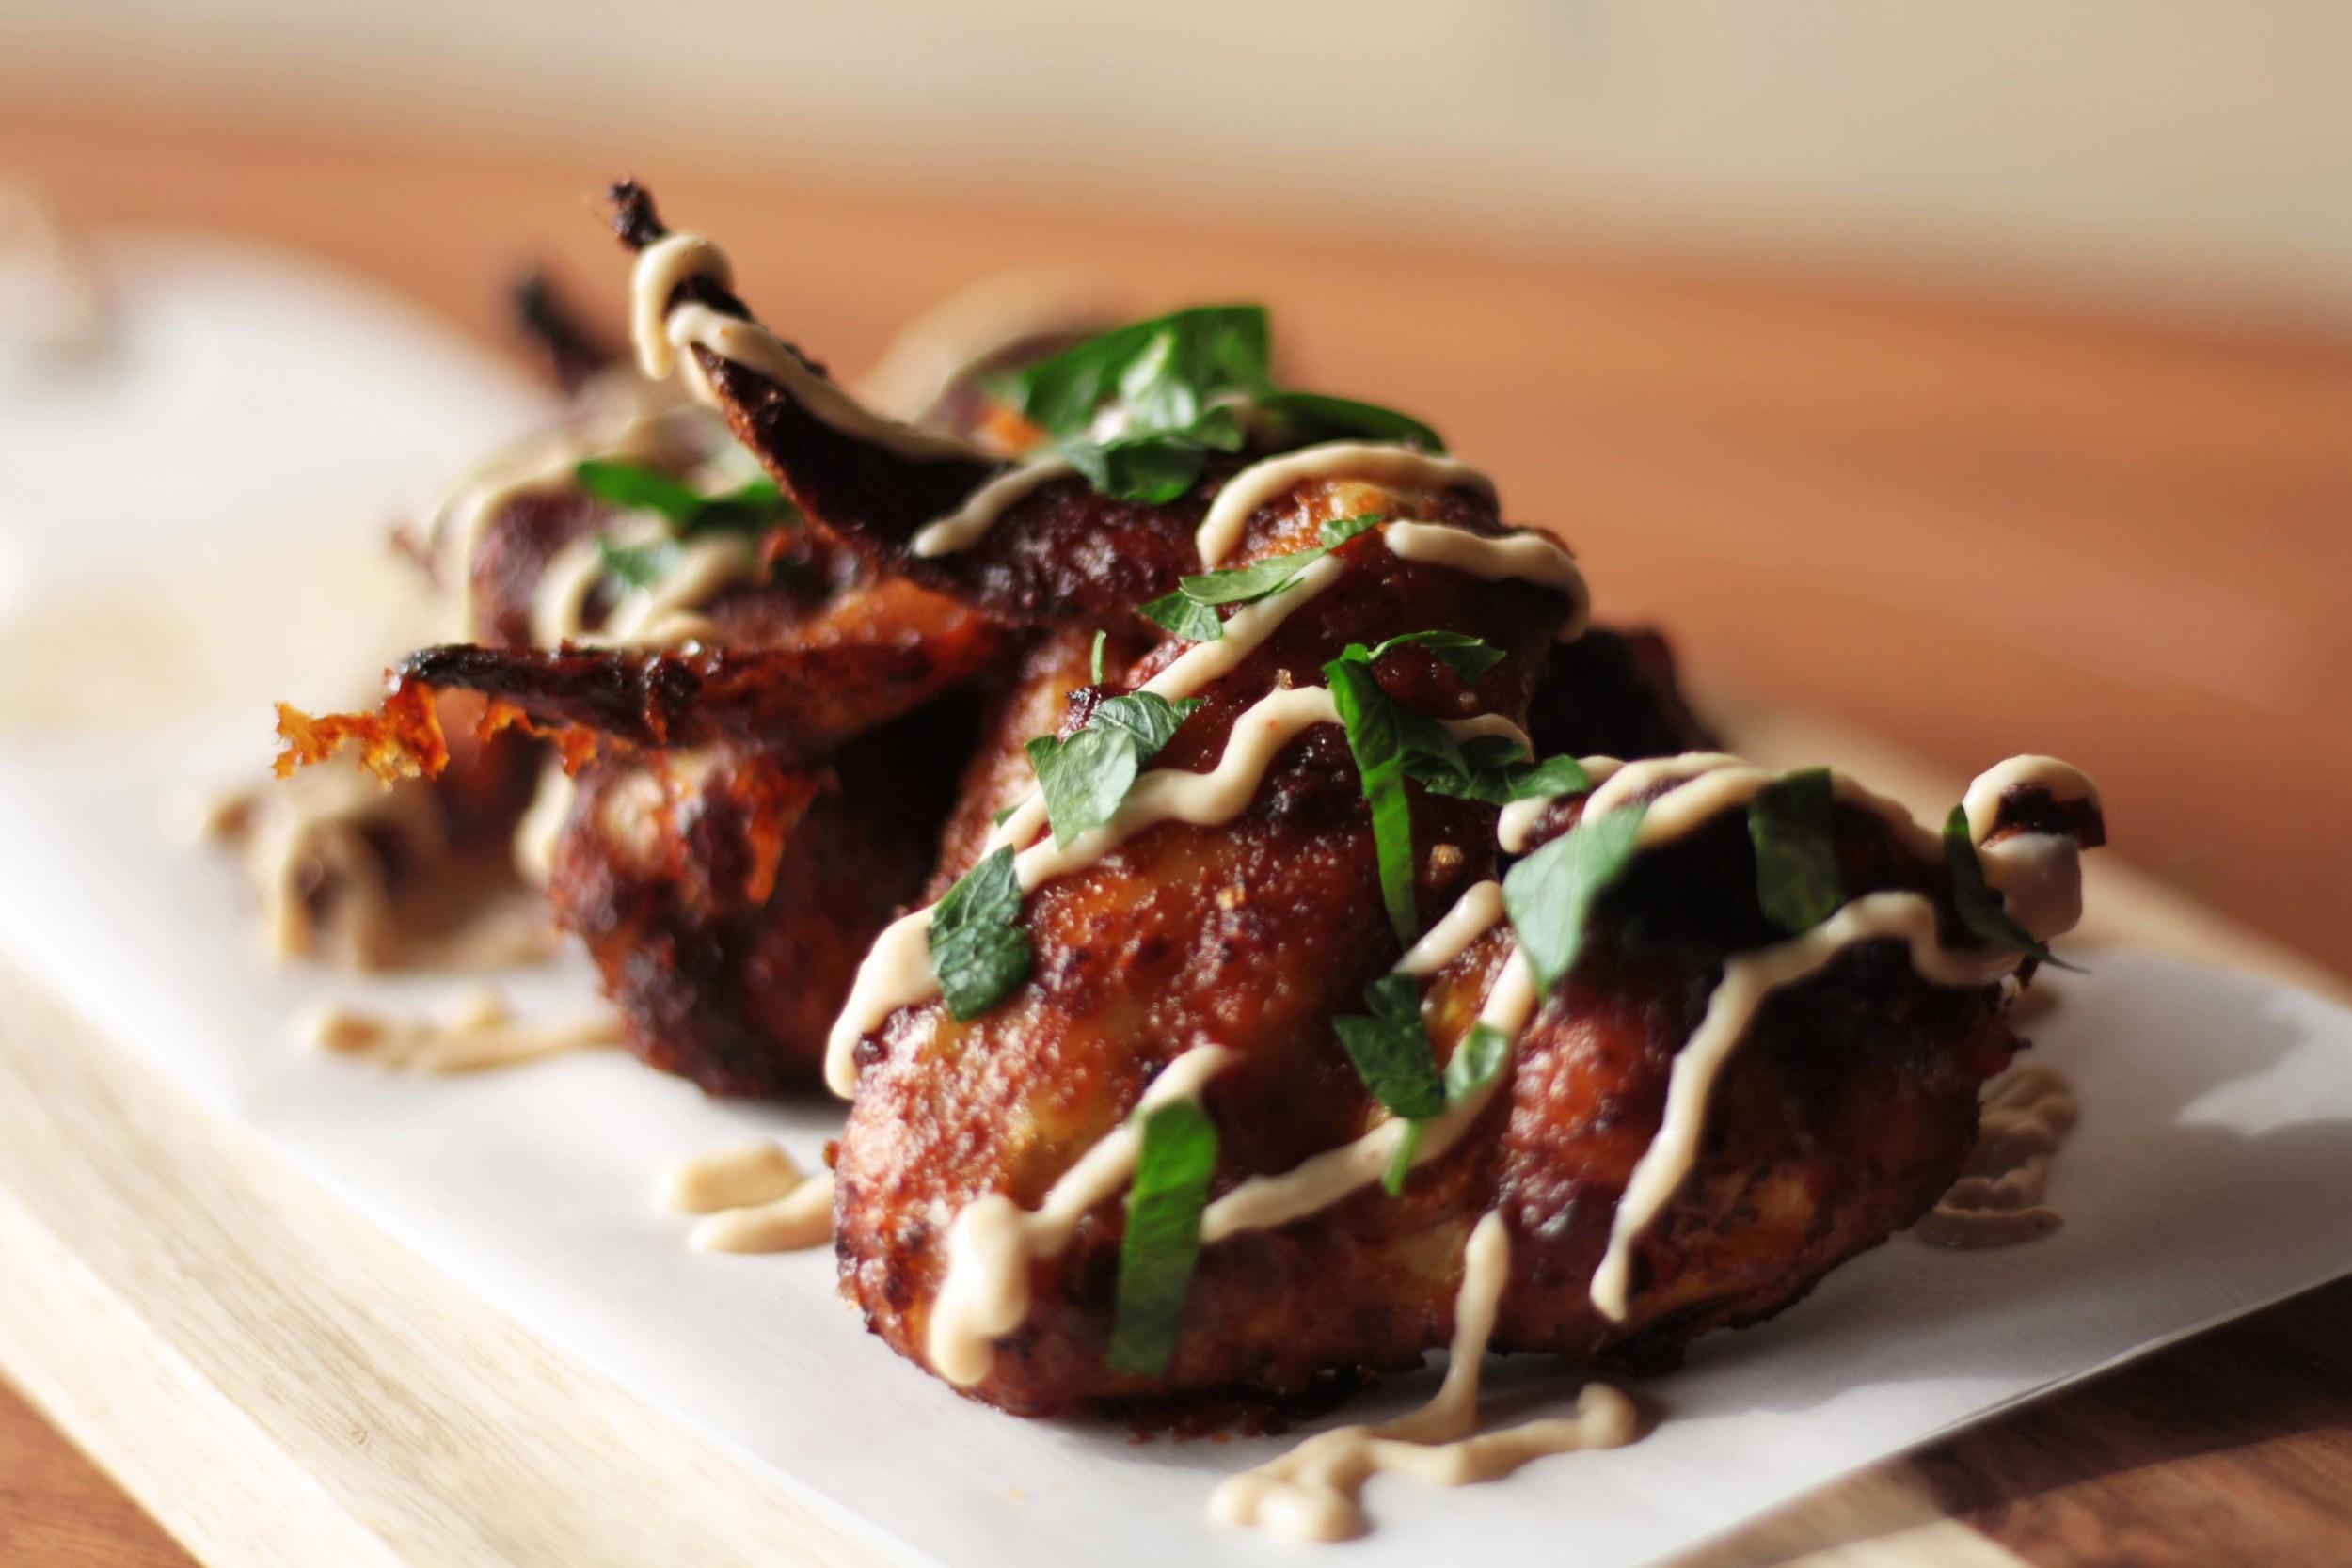 Sous vide shawarma chicken wings with roasted garlic tahini dip